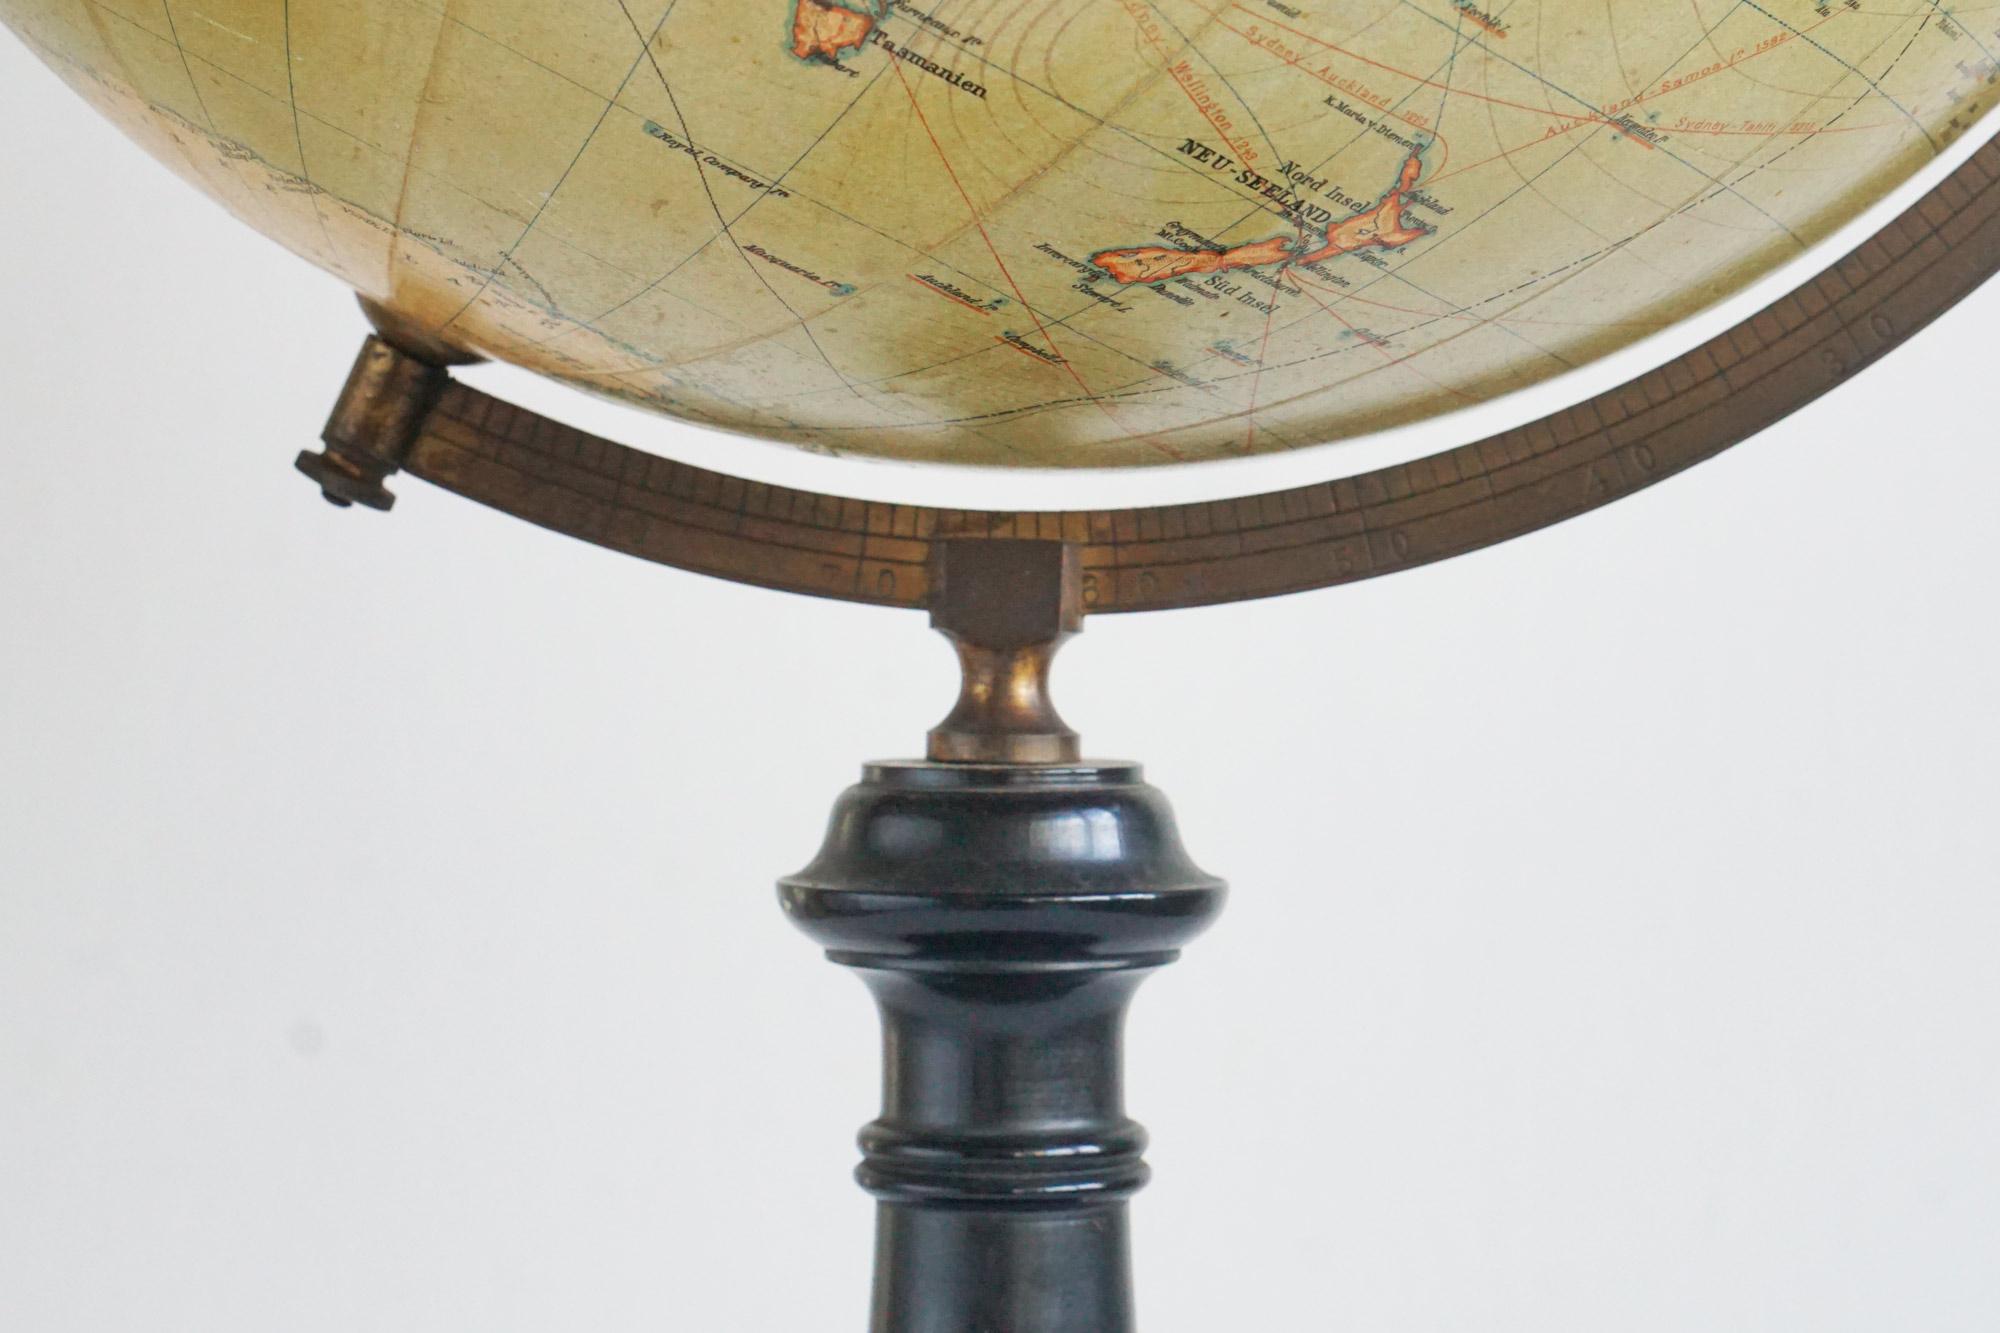 Pre-WW1 Antique Globe by Globushaus G.M.B.H. Berlin